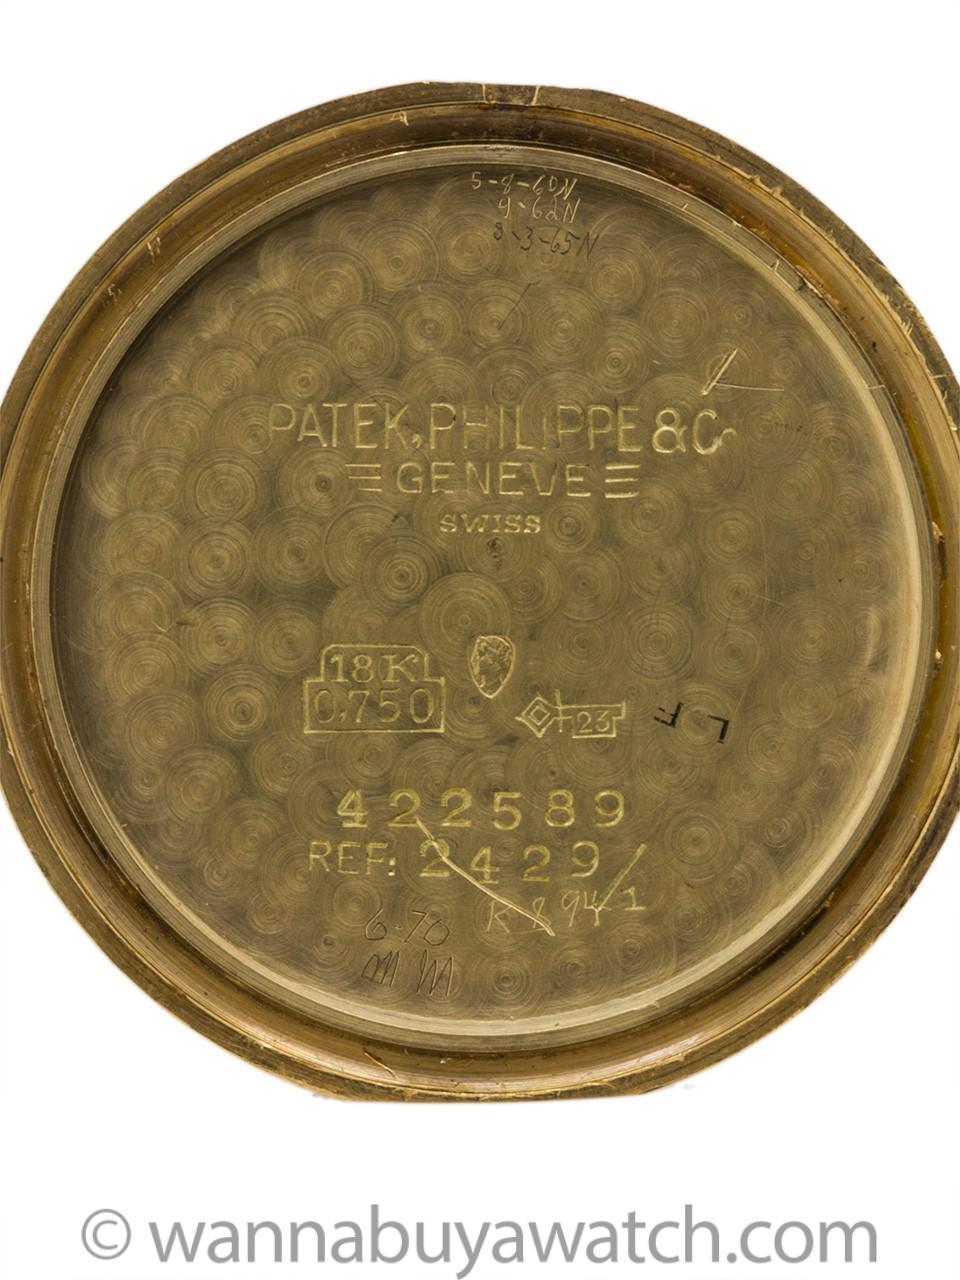 Patek Philippe 18K YG Ref 2429 circa 1955+